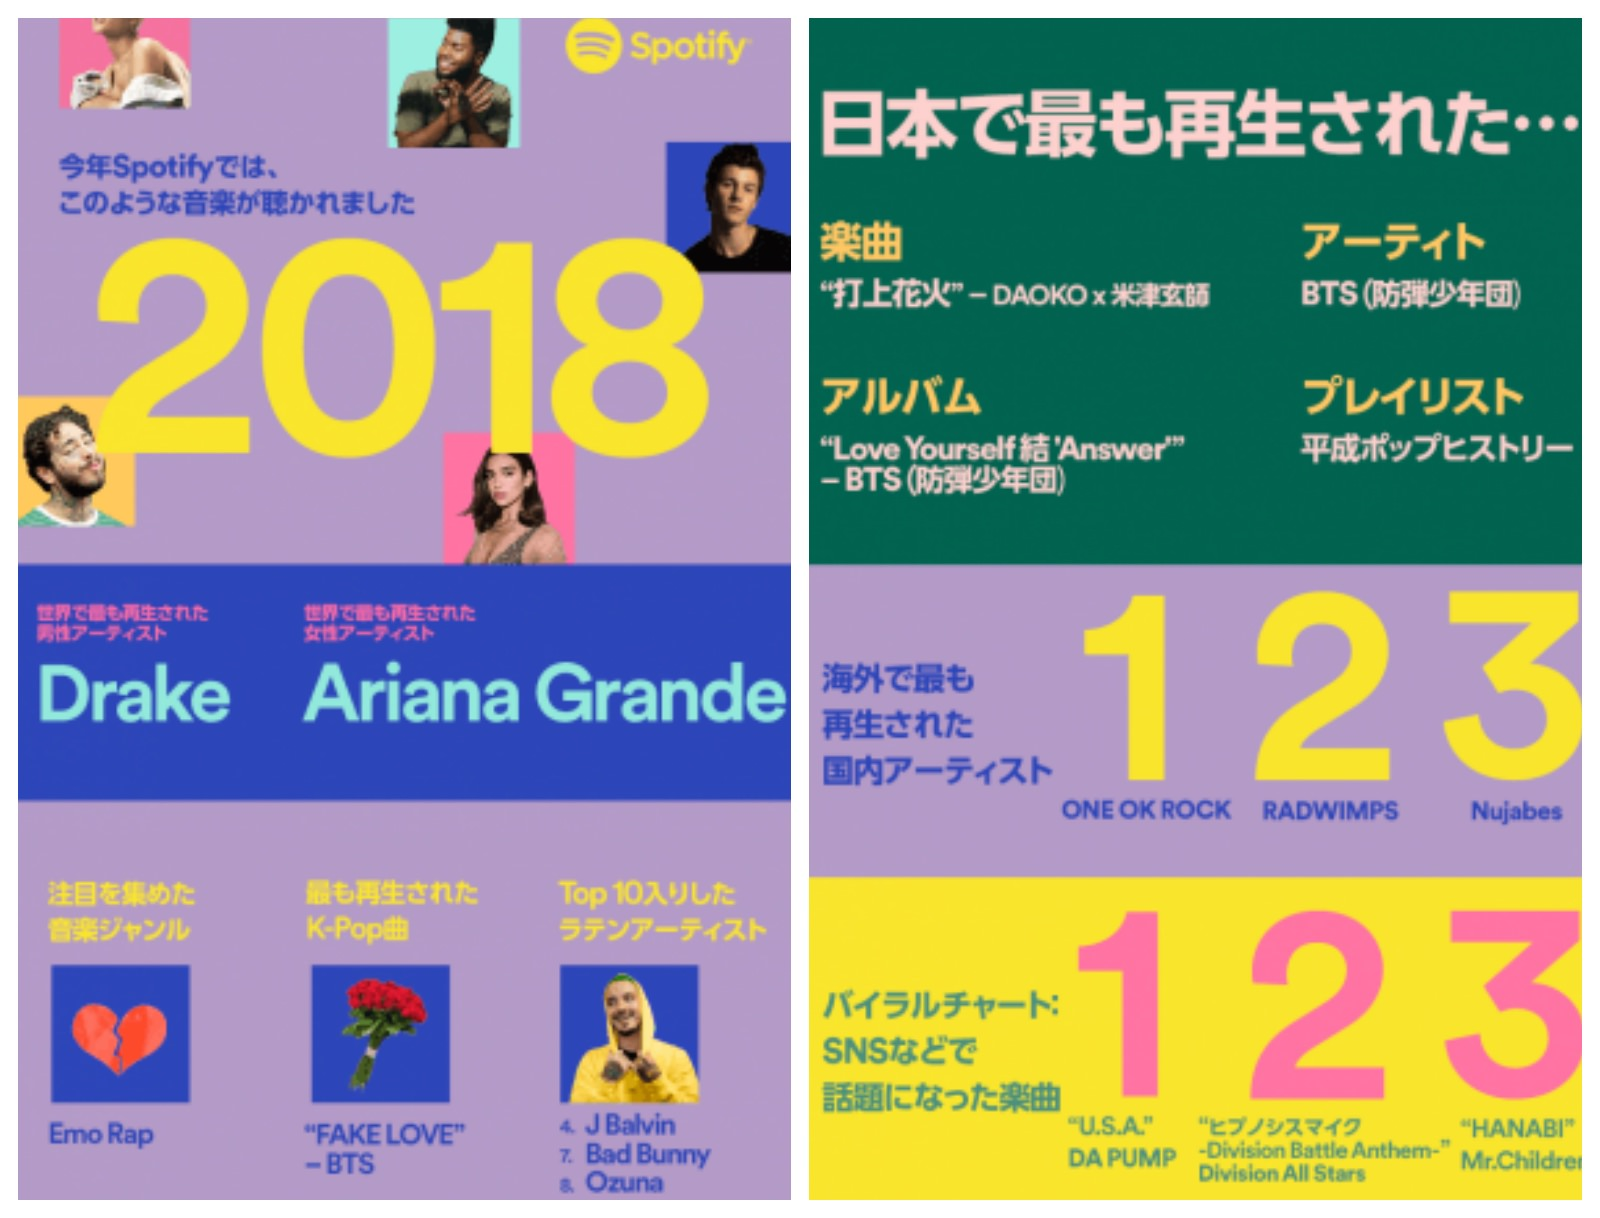 Spotify 2018 ranking